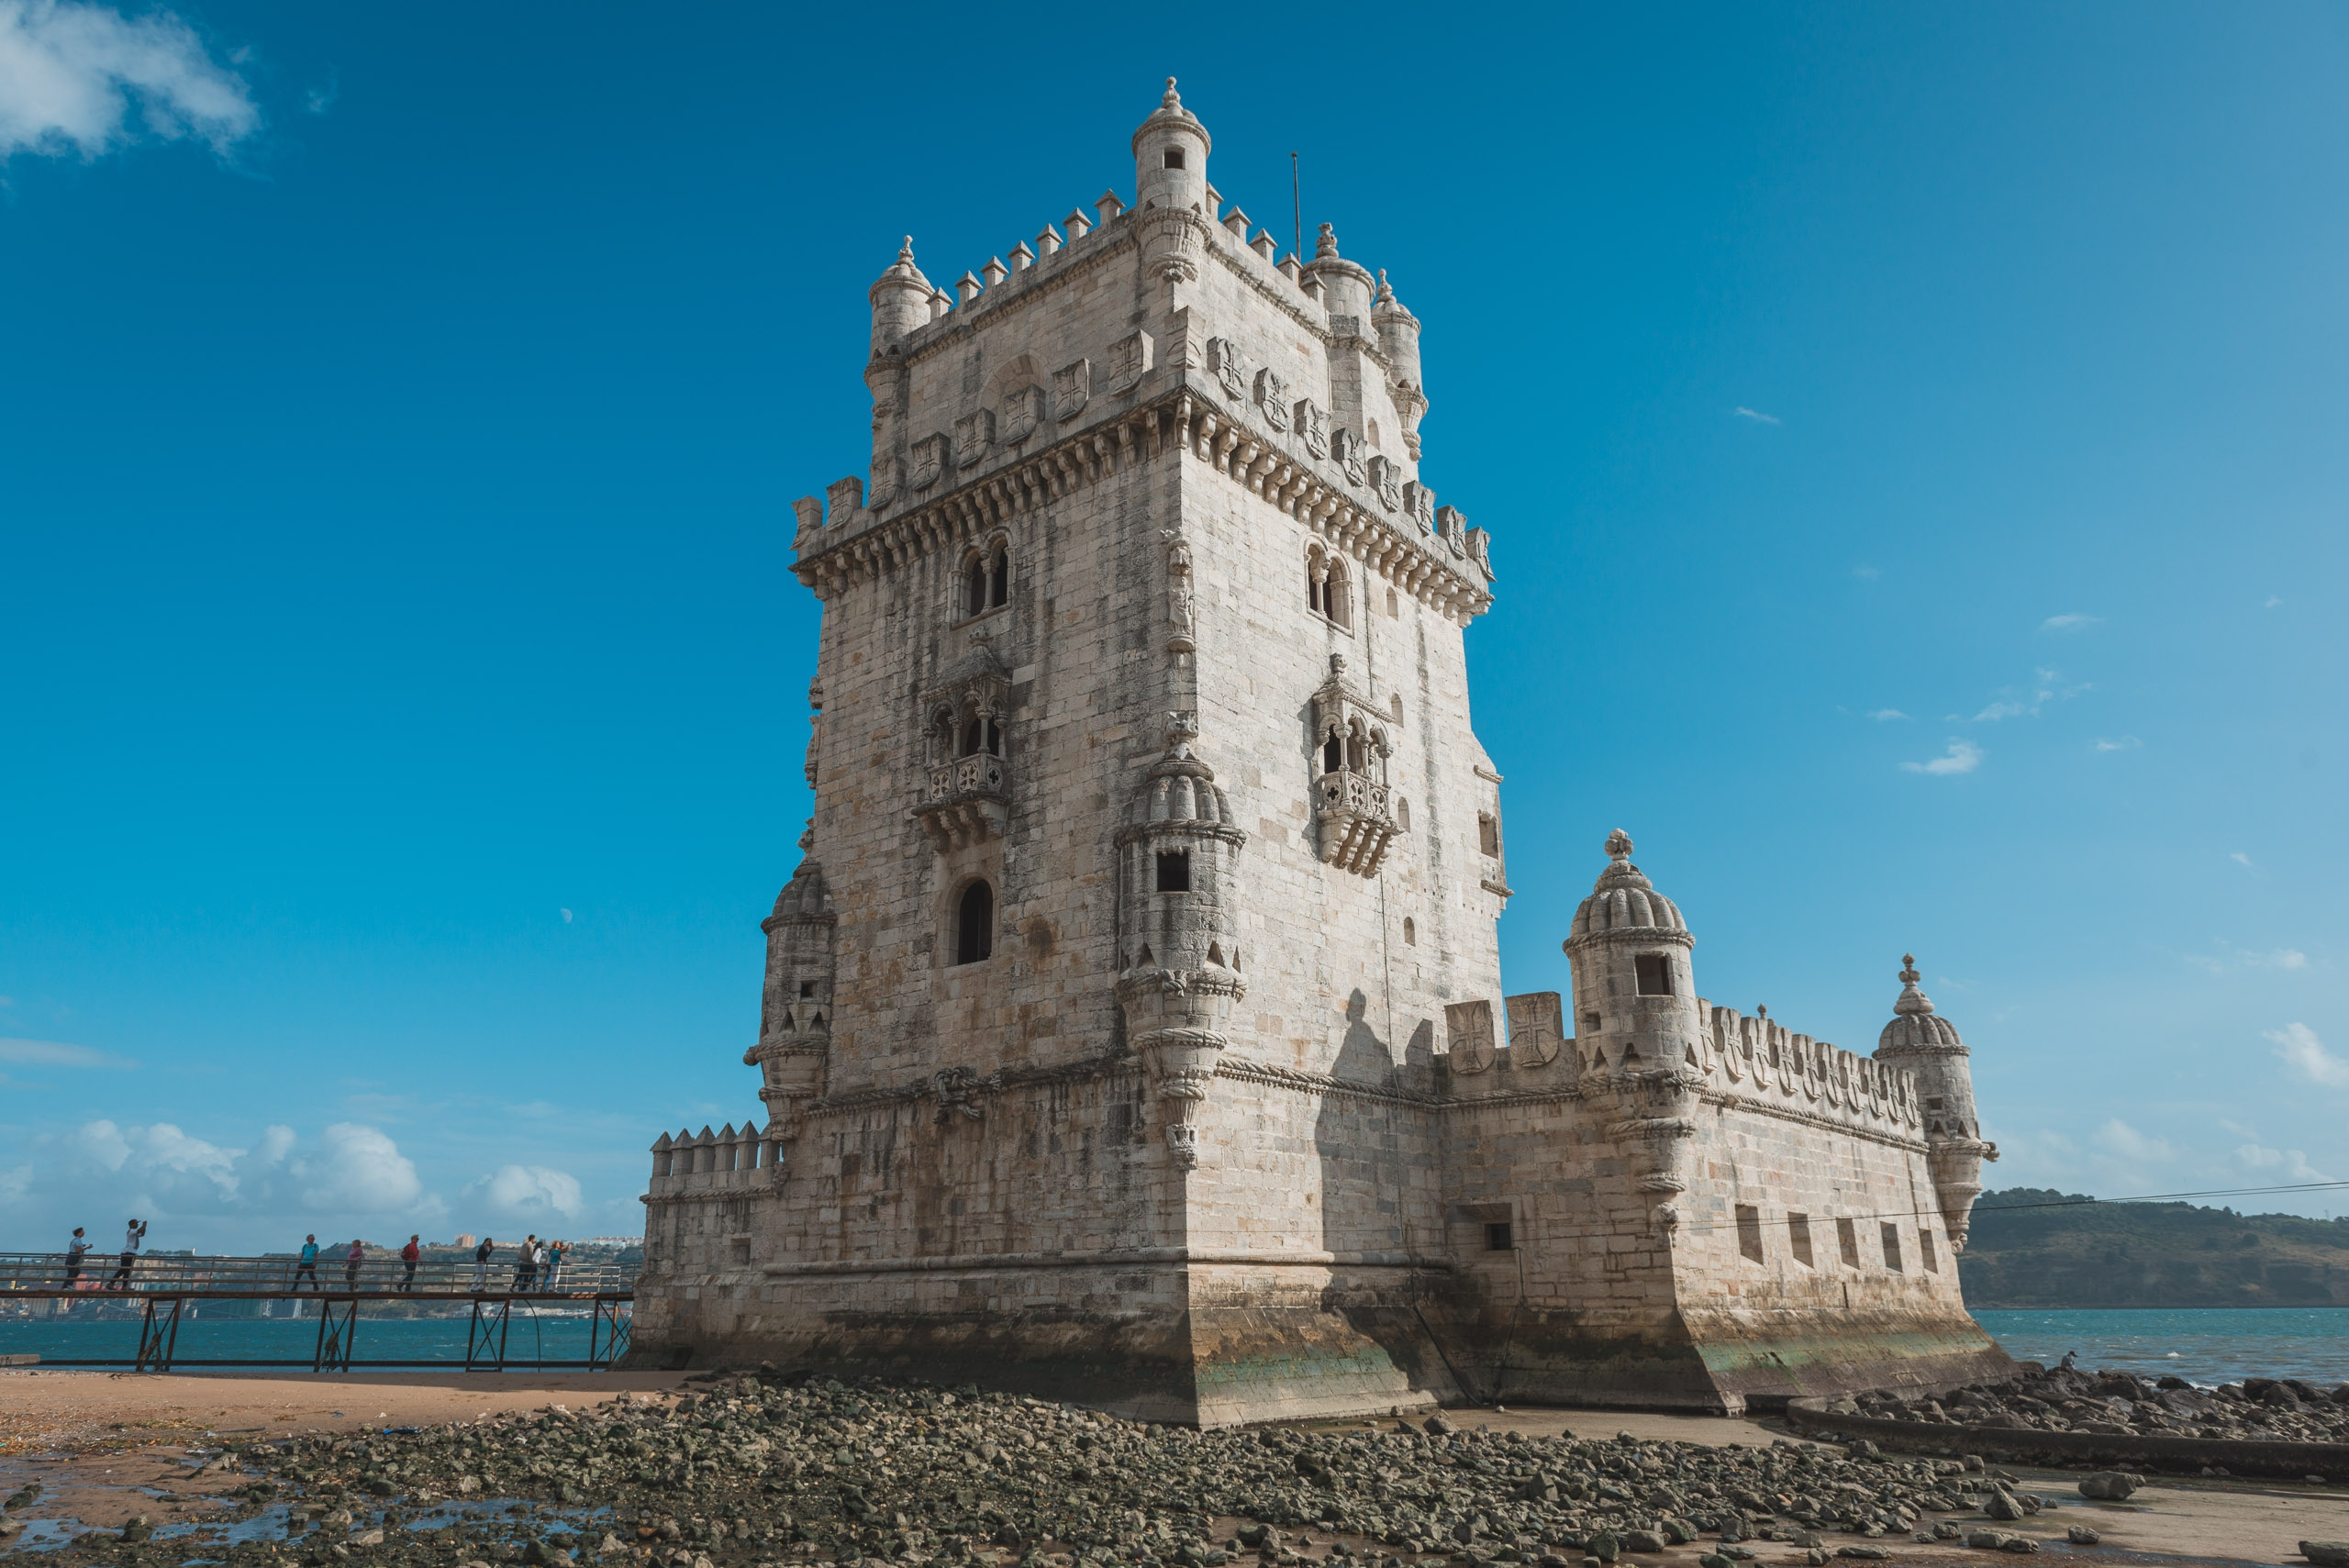 Portugal - Lisbon - 2012-0922-DSC_1552_36680